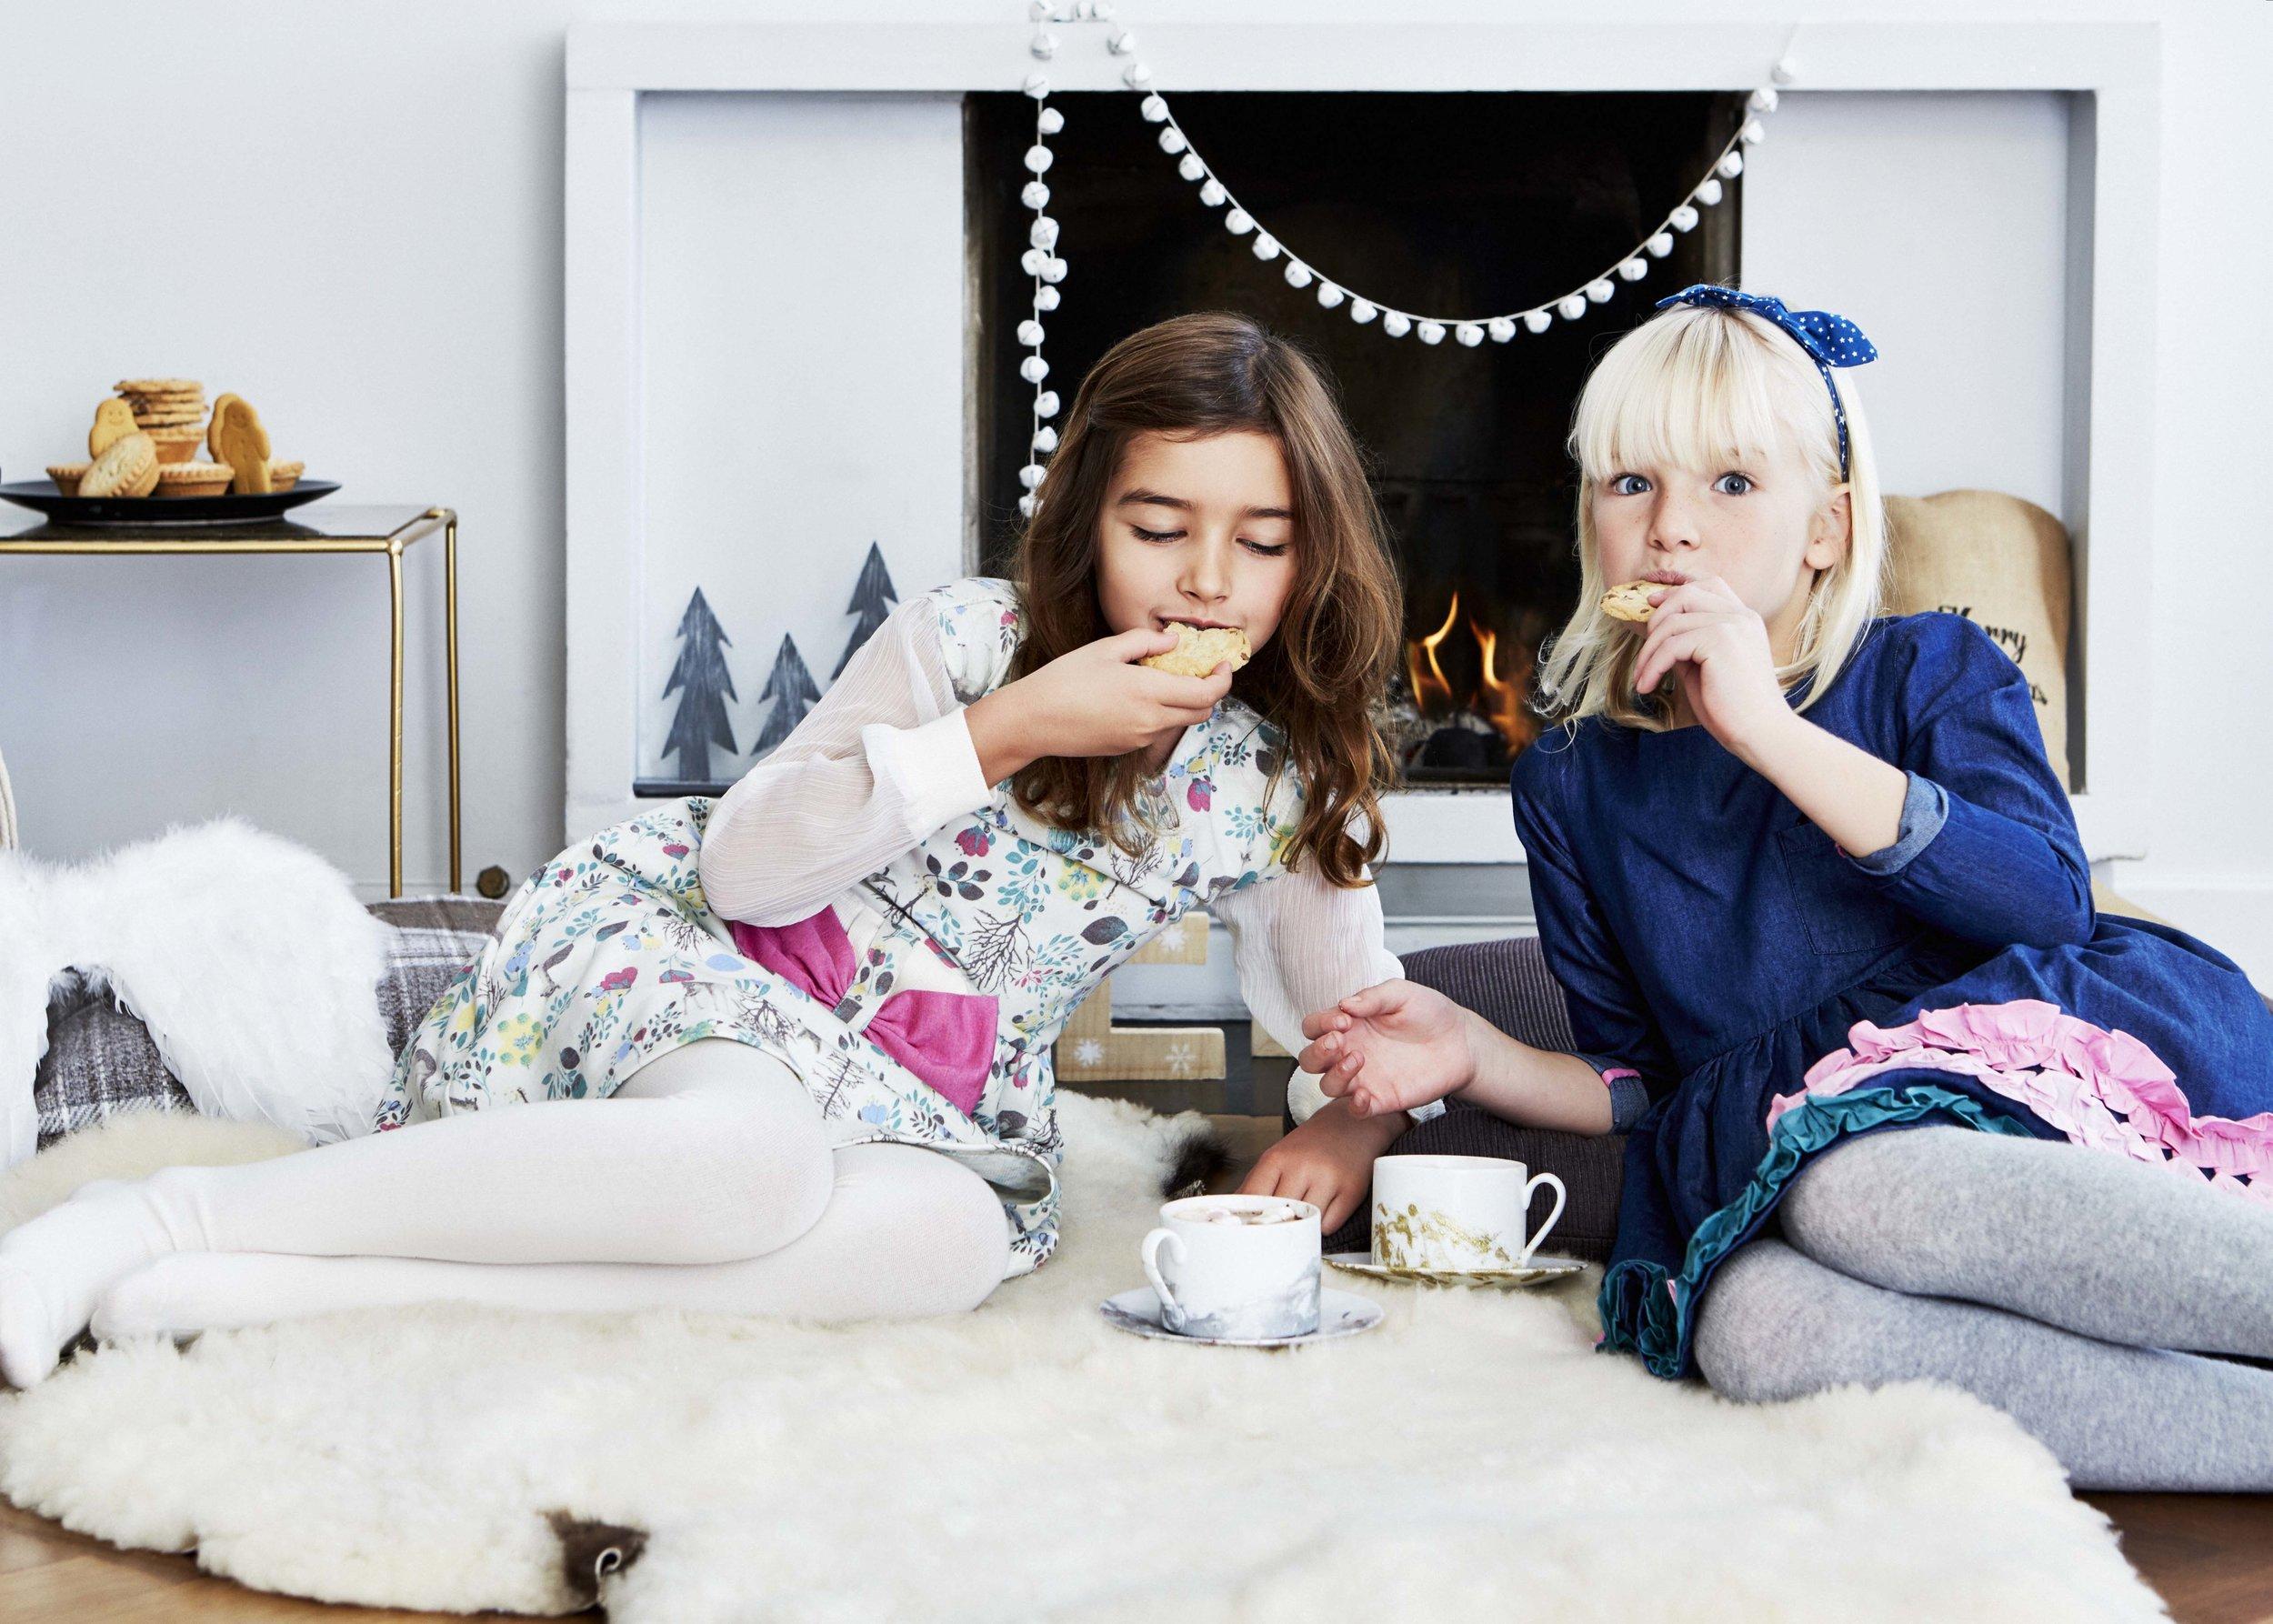 Liz_Cooper_Interior_Stylist_Styling_Kids_christmas_Cookies_By__Fire.jpg